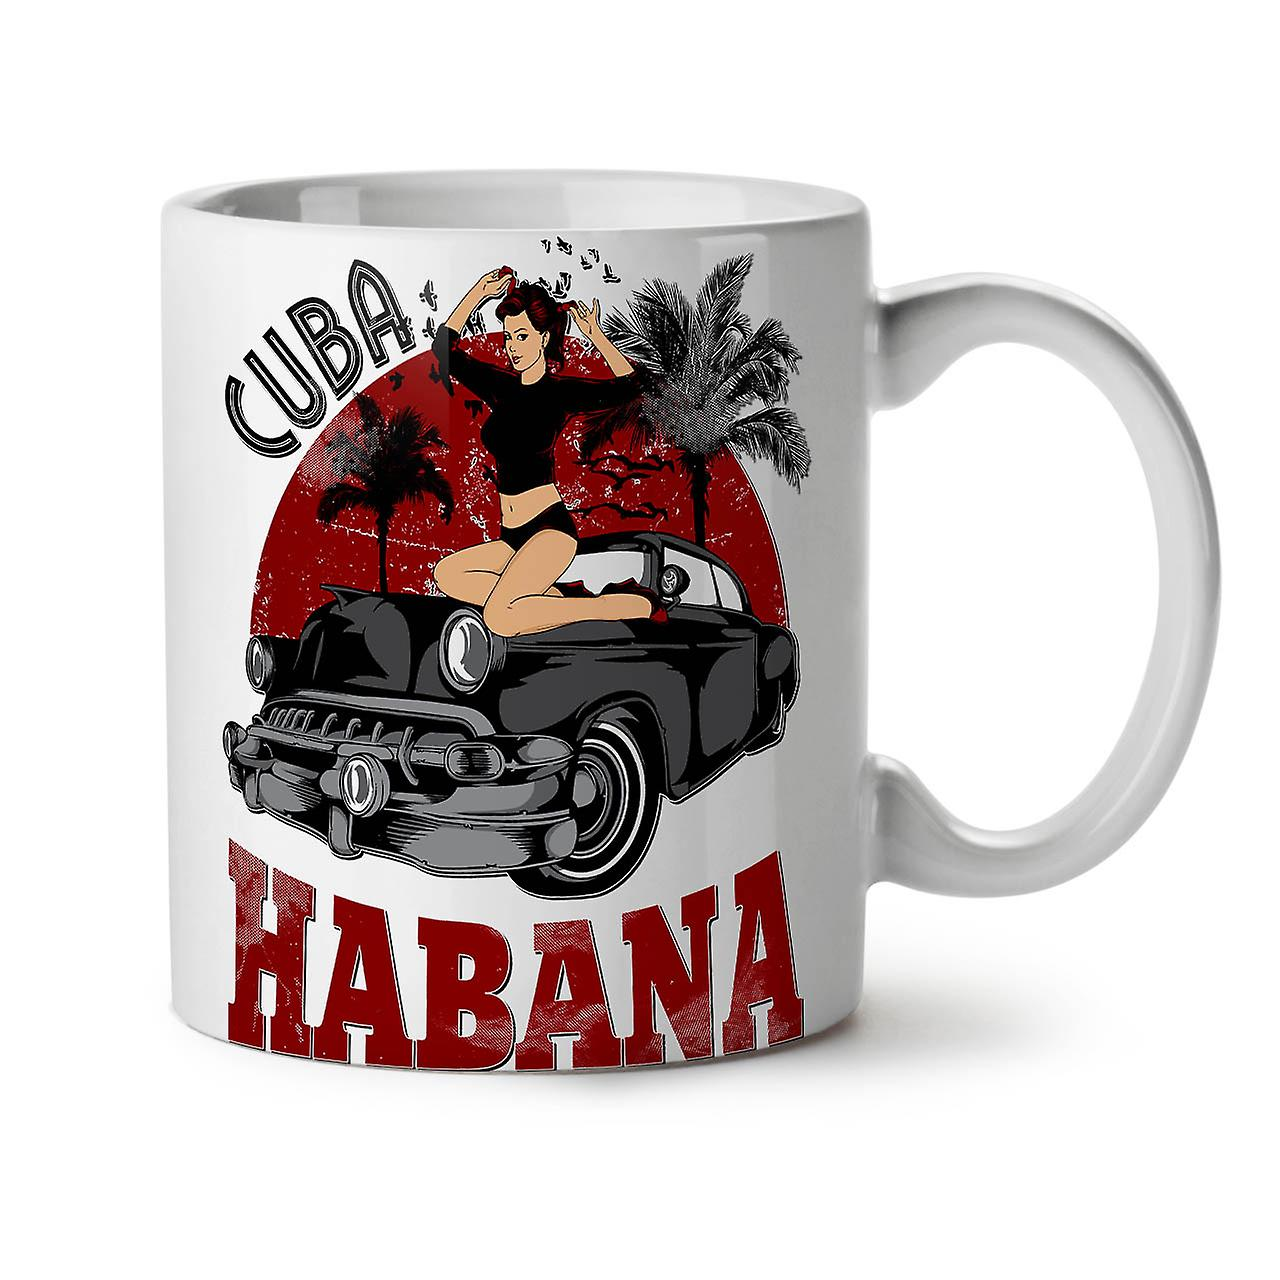 Thé OzWellcoda Café Capital Blanc Habana 11 Tasse Nouveau Céramique Cuba erBodCx